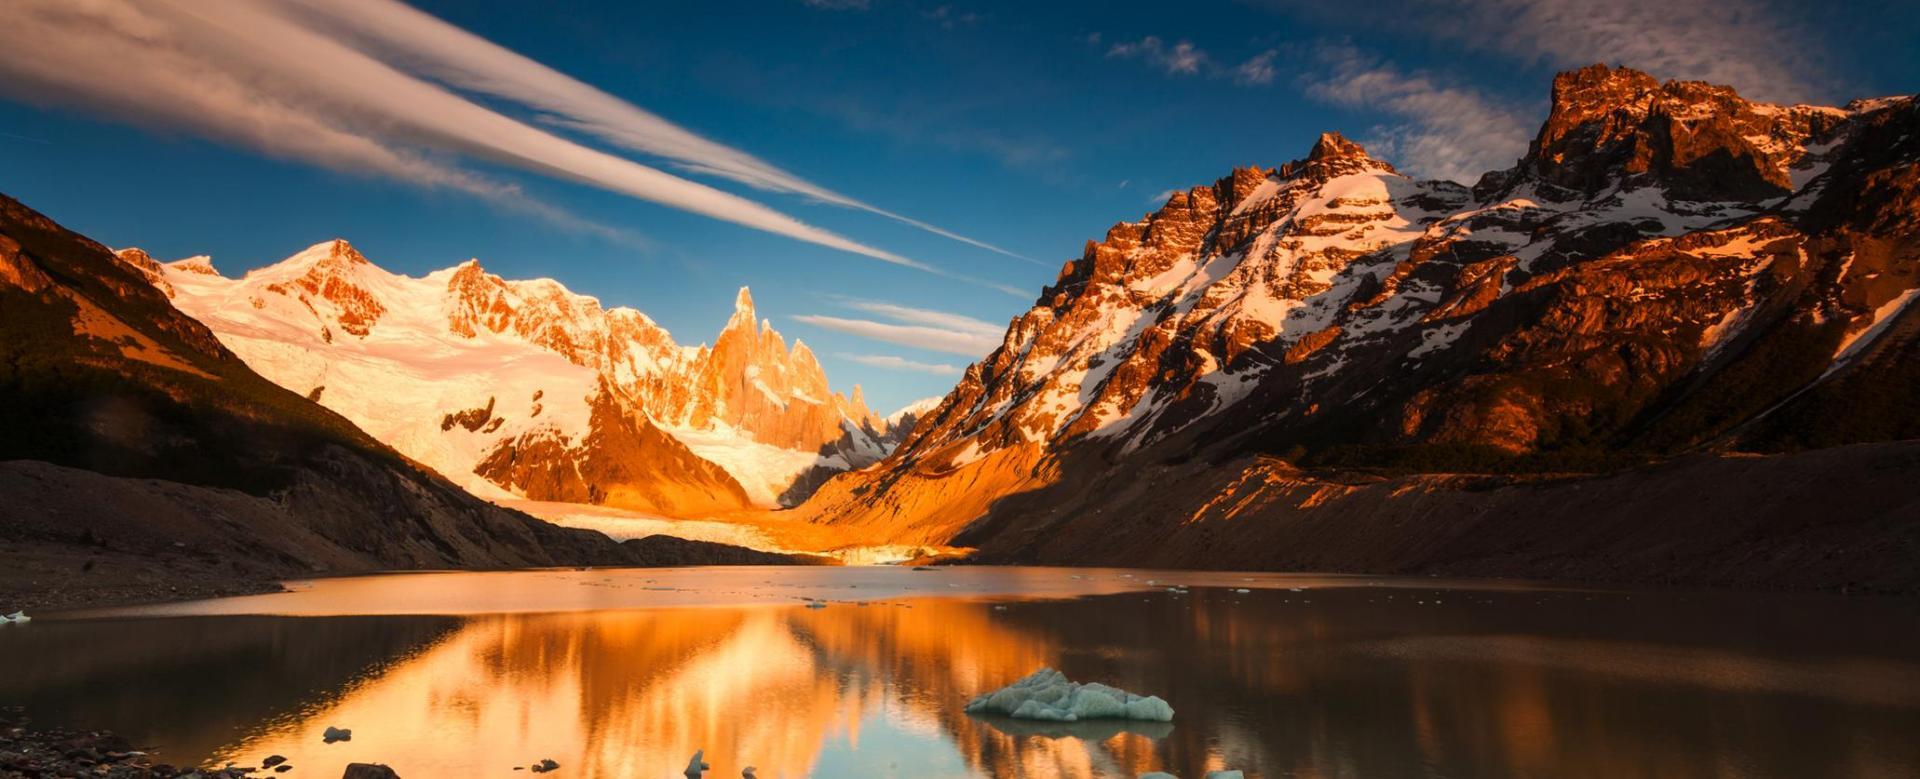 Voyage à pied : Patagonie-terre de feu